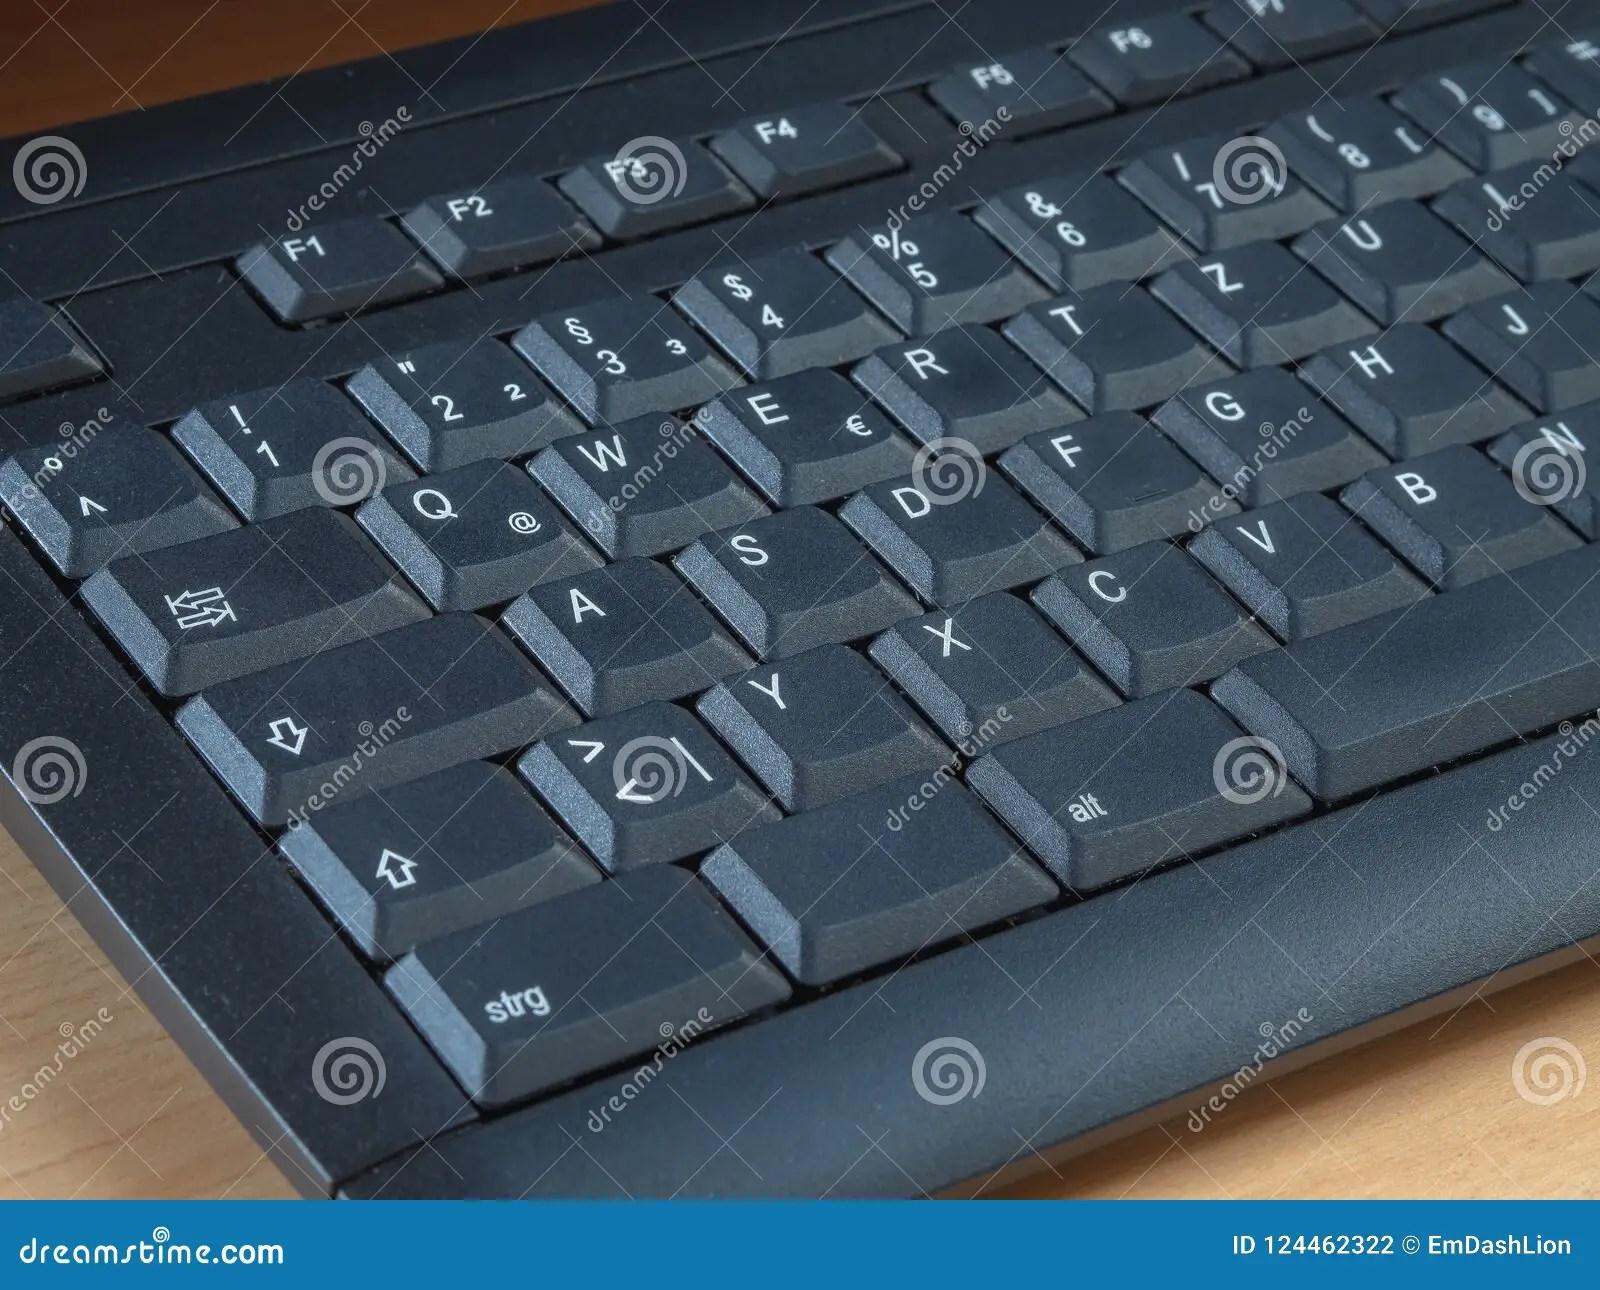 German Black Computer Keyboard With A Blank Key Stock